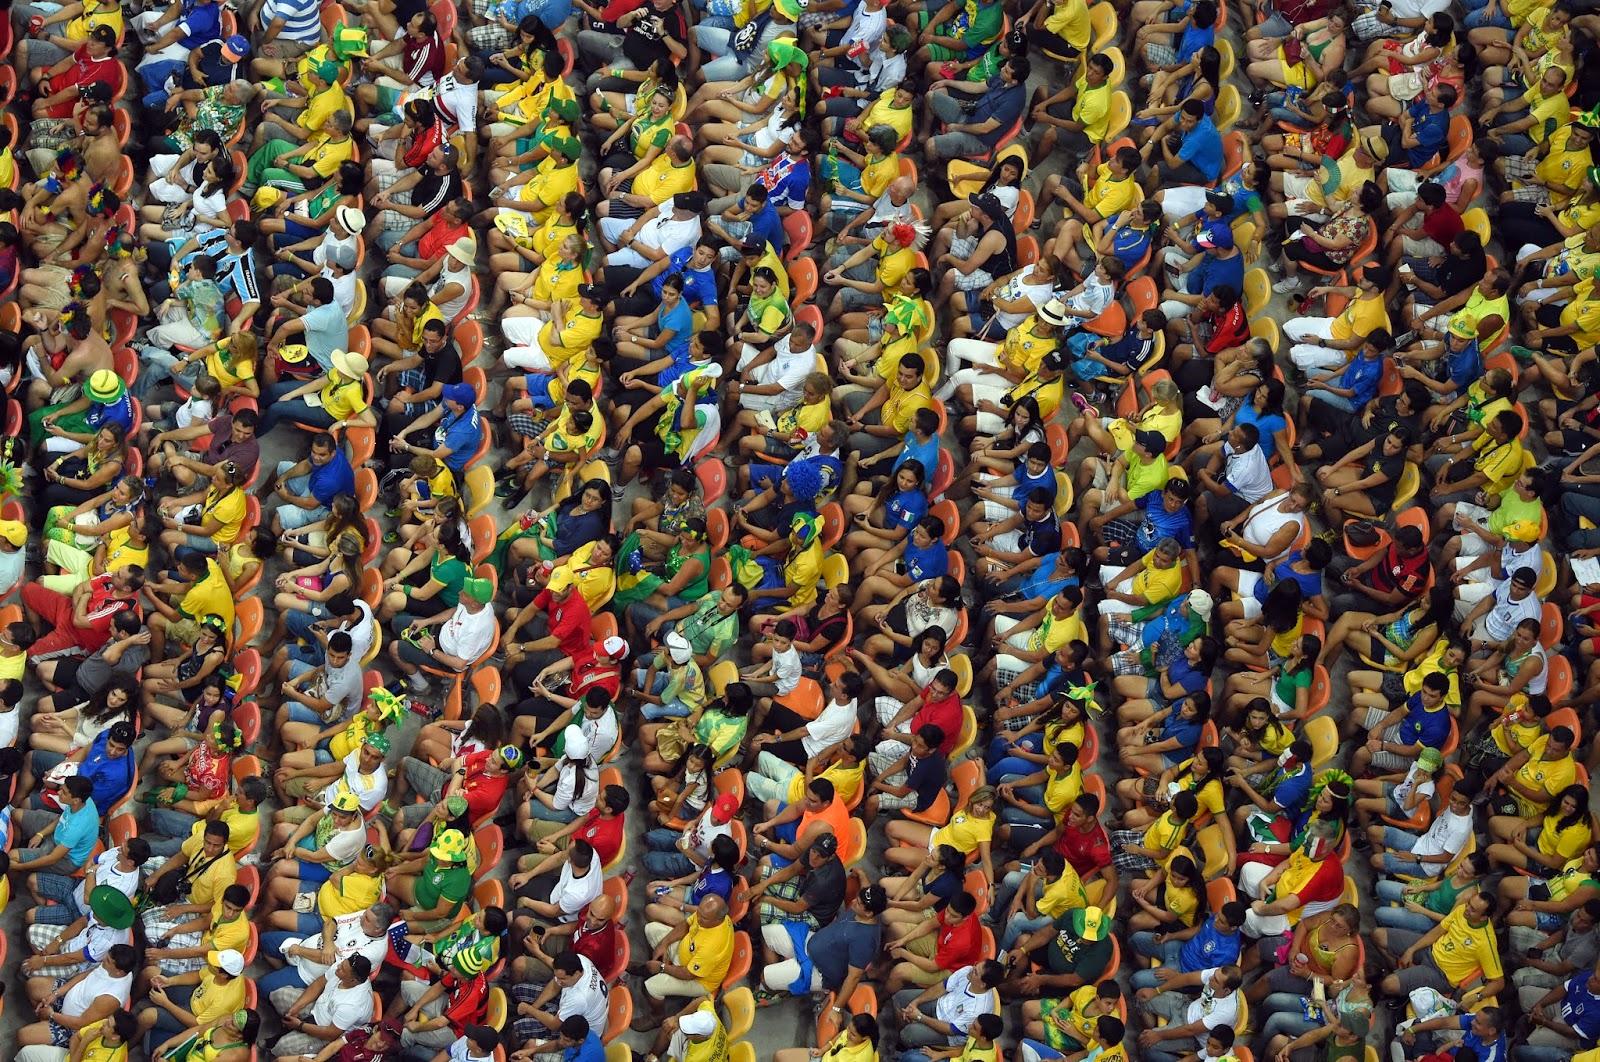 FIFA World Cup 2014, FIFA World Cup, England vs Italy, Mario Balotelli, England Squad, Italy Squad, Football, Sports, Brazil, Matteo Darmian, Claudio Marchisio, Group D, Daniel Sturridge, Andrea Pirlo, Wayne Rooney, Daniel Sturridge